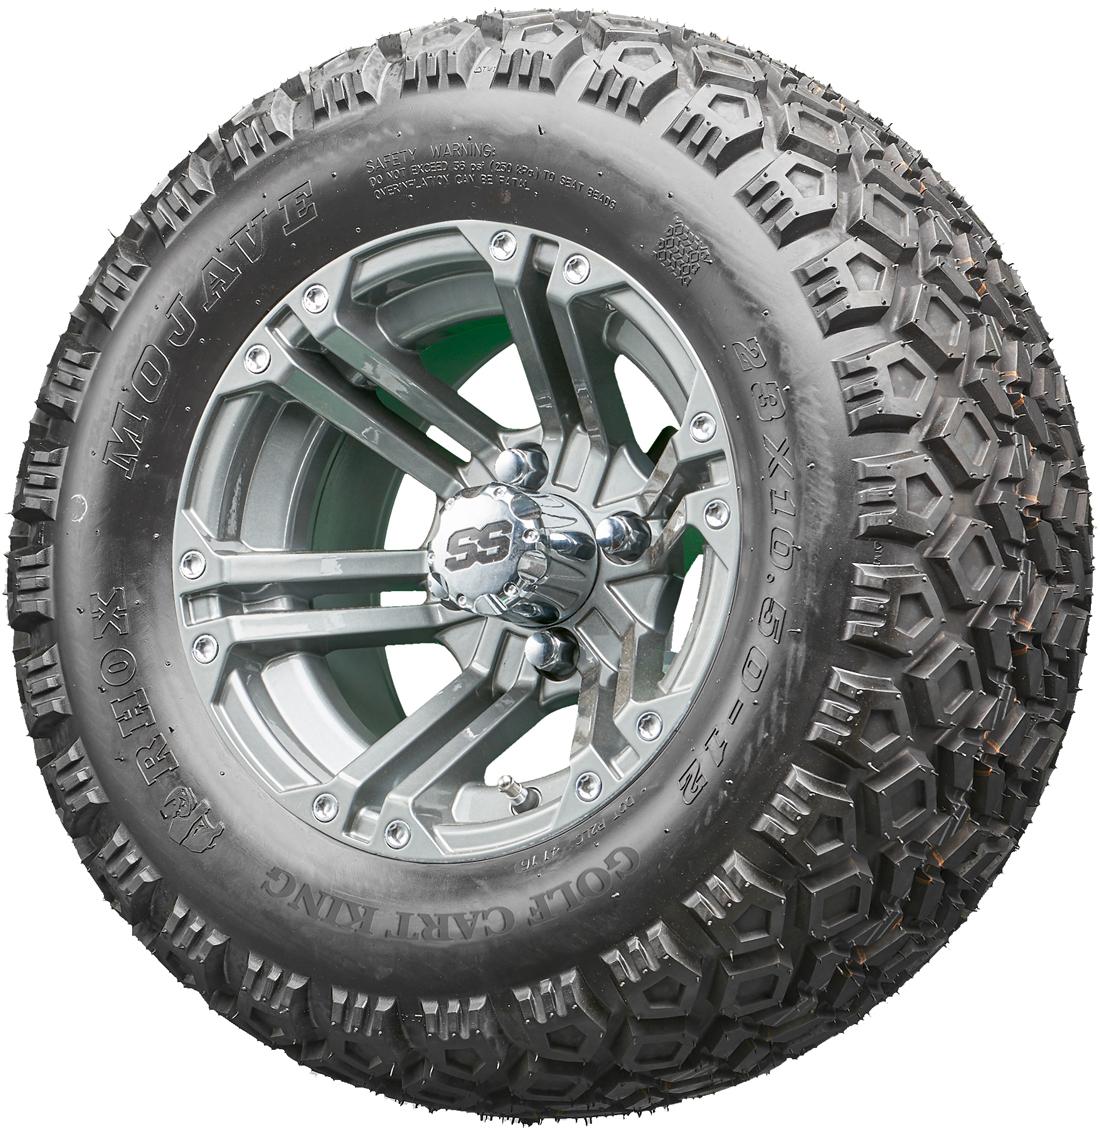 medium resolution of golf cart wheels and tires rhox rx335 gun metal 12 lifted tires combo